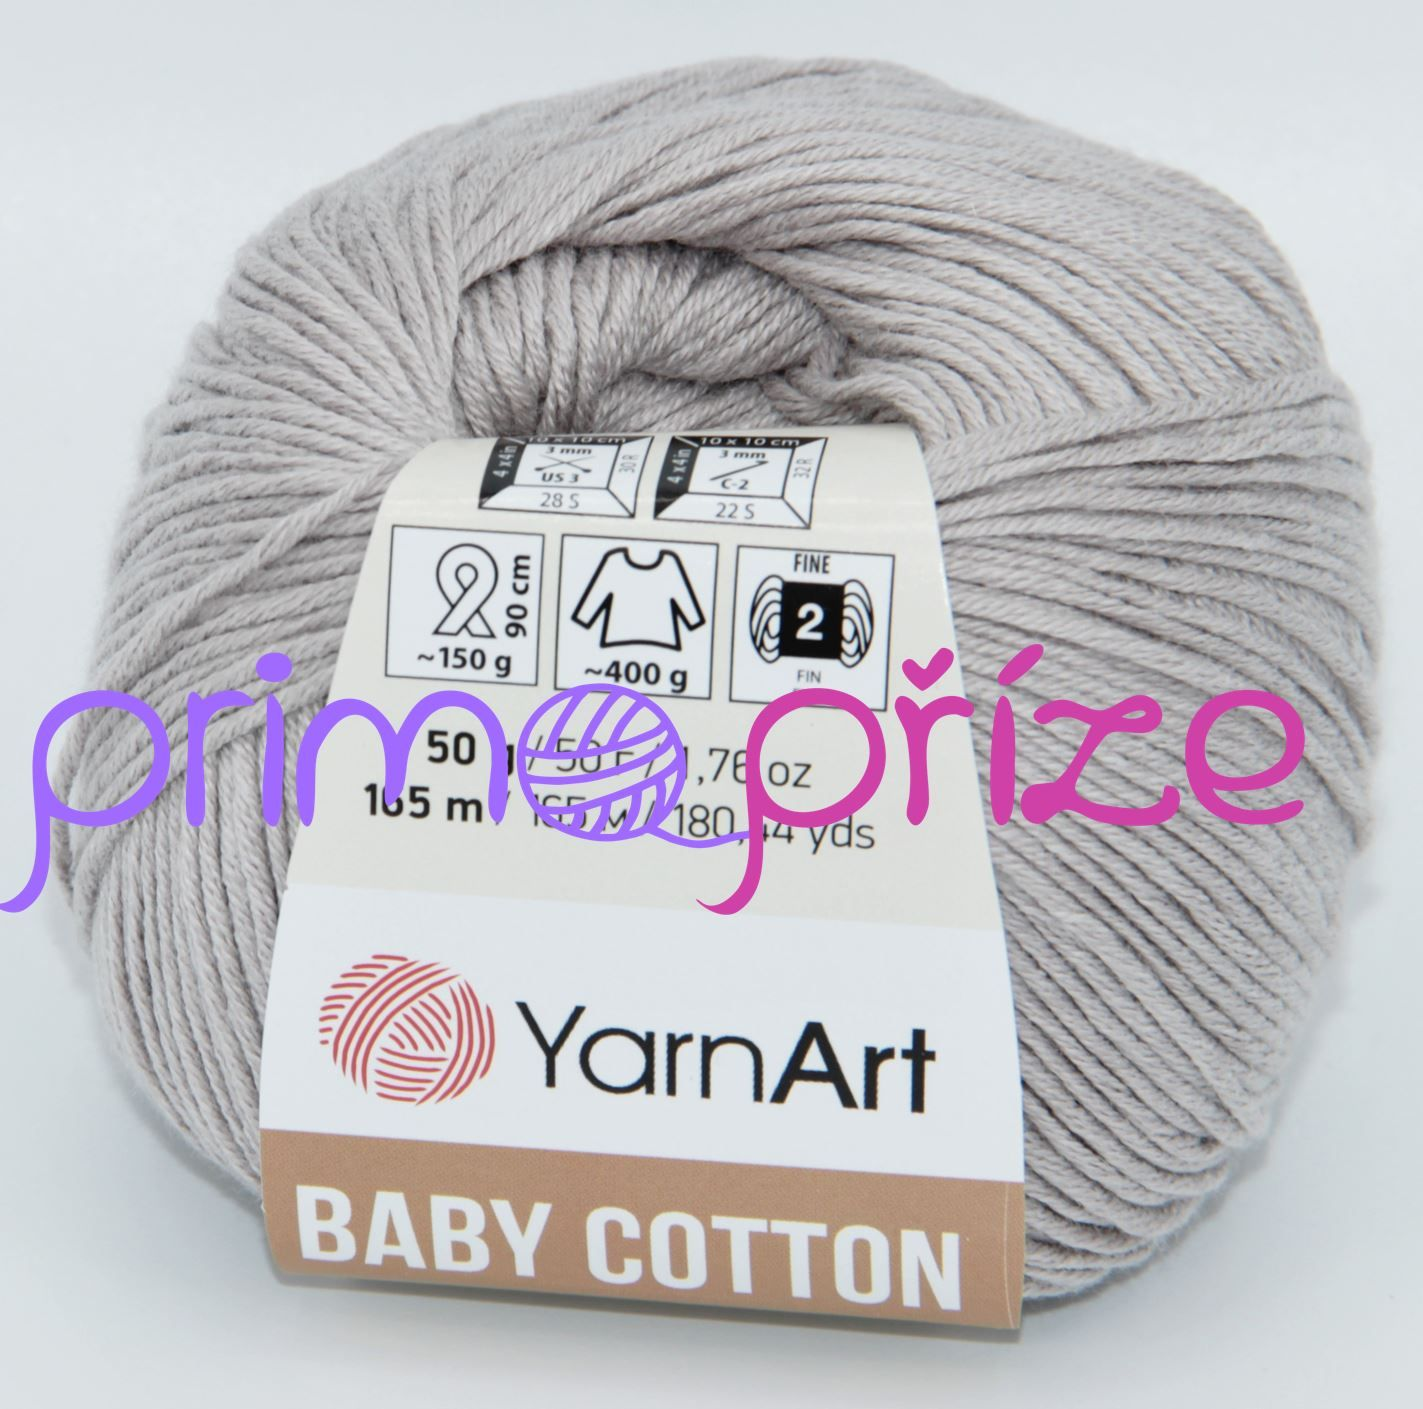 YarnArt Baby Cotton 406 světle šedá